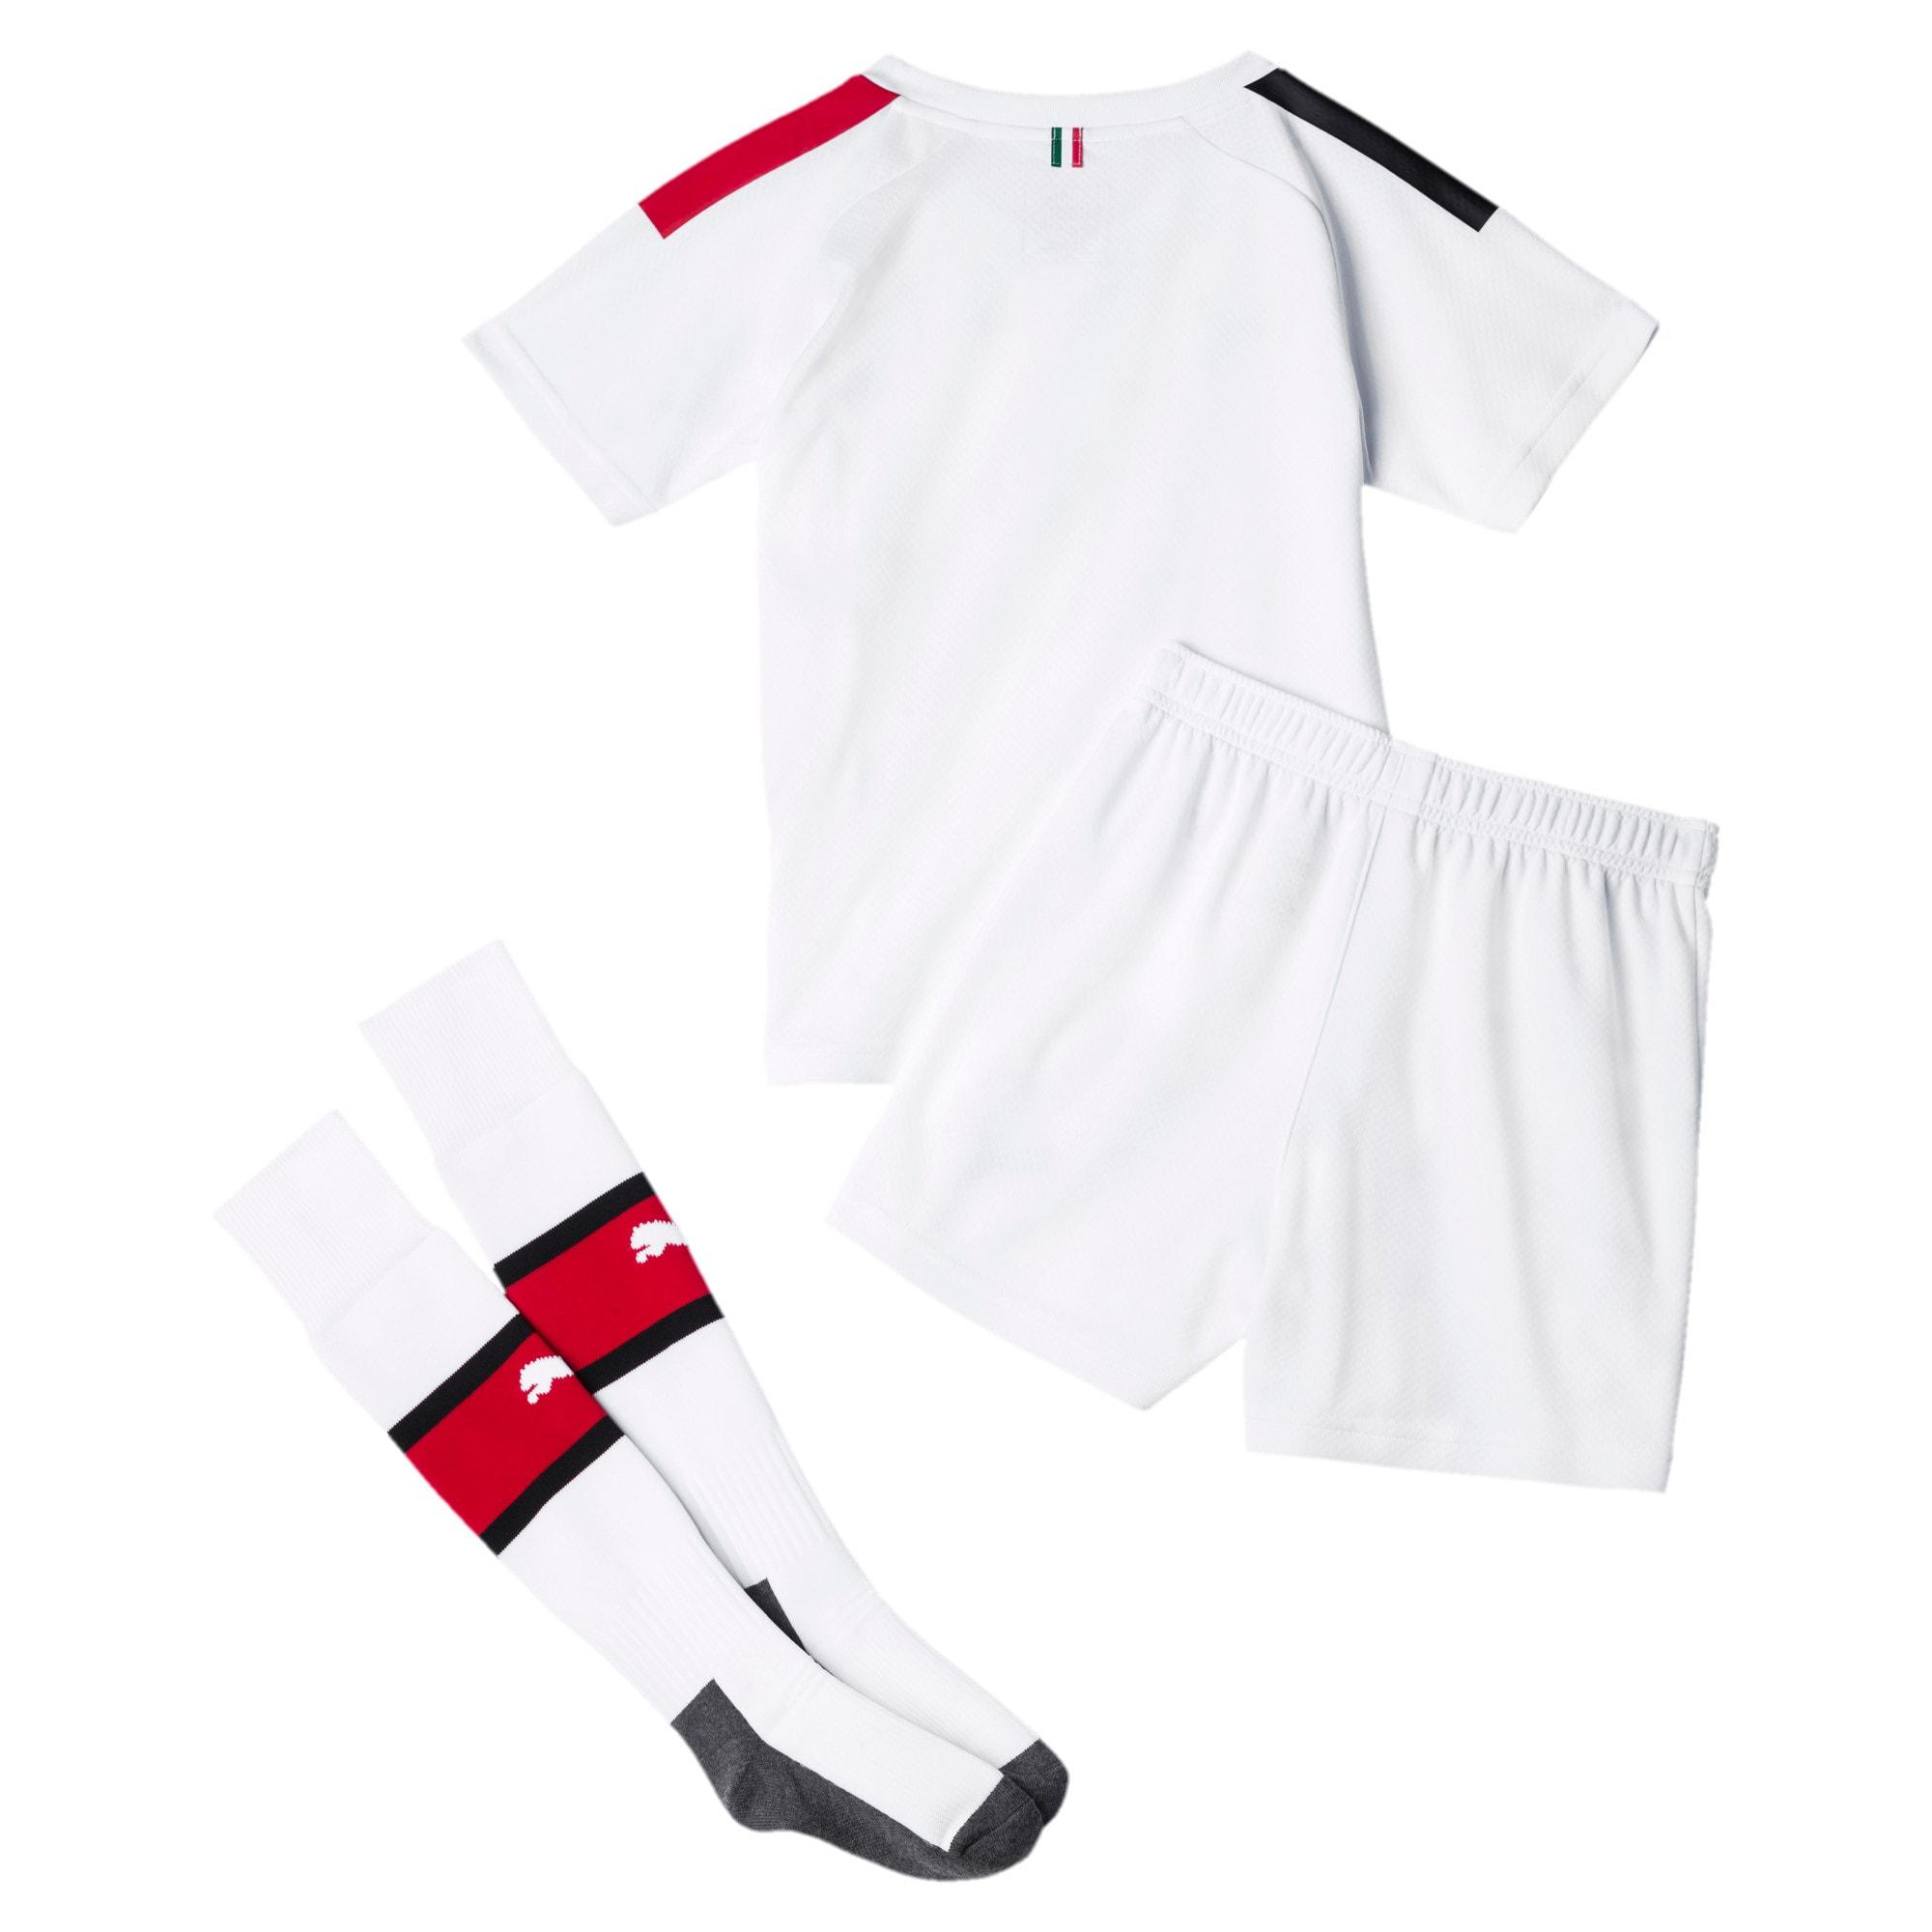 Thumbnail 2 of AC Milan Away Mini Kit, Puma White-Tango Red, medium